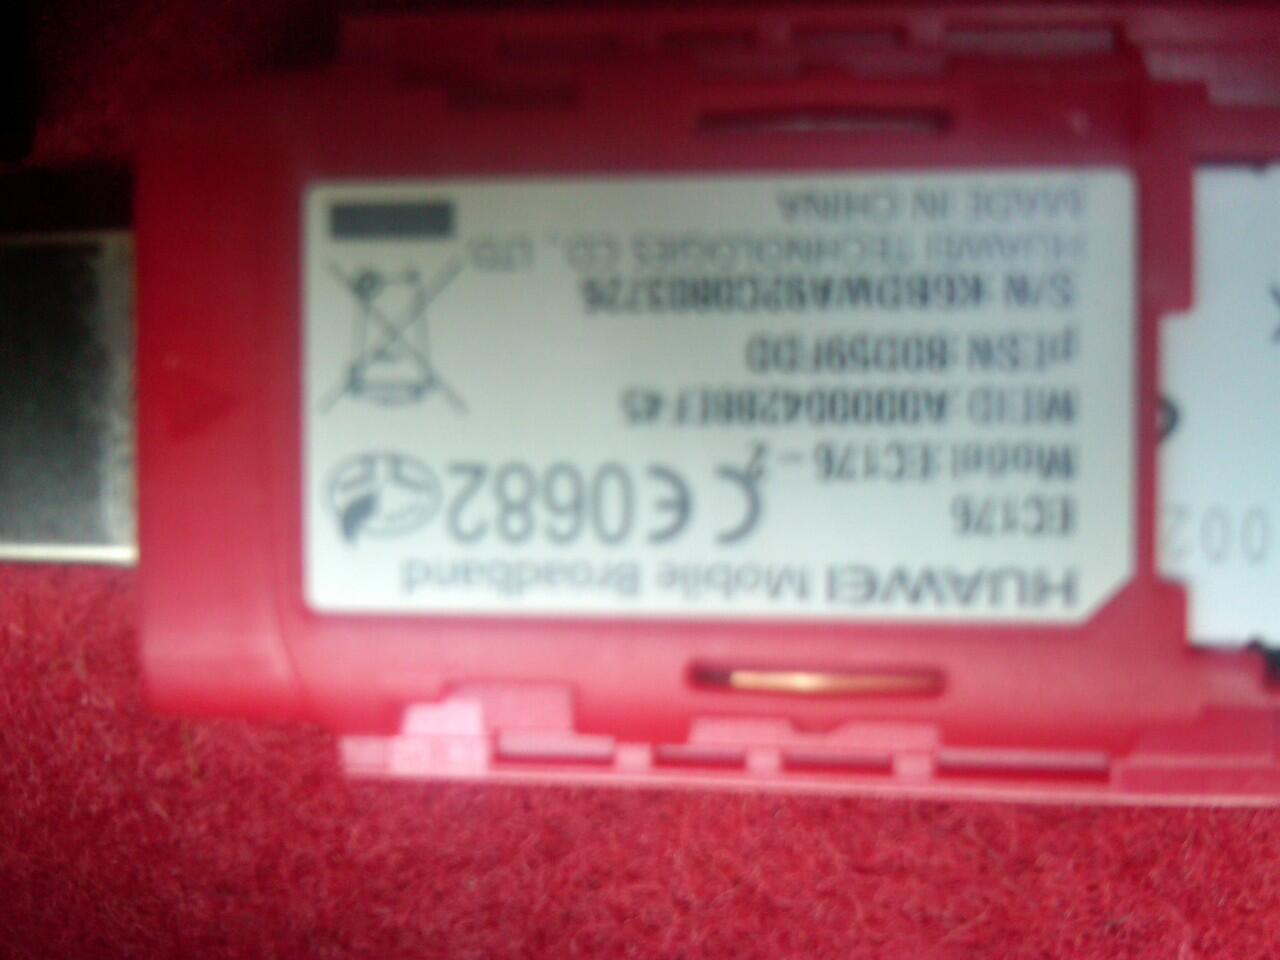 Modem CDMA EVDO Smartfren Huawei EC176-2 Unlock SOLO MURAH